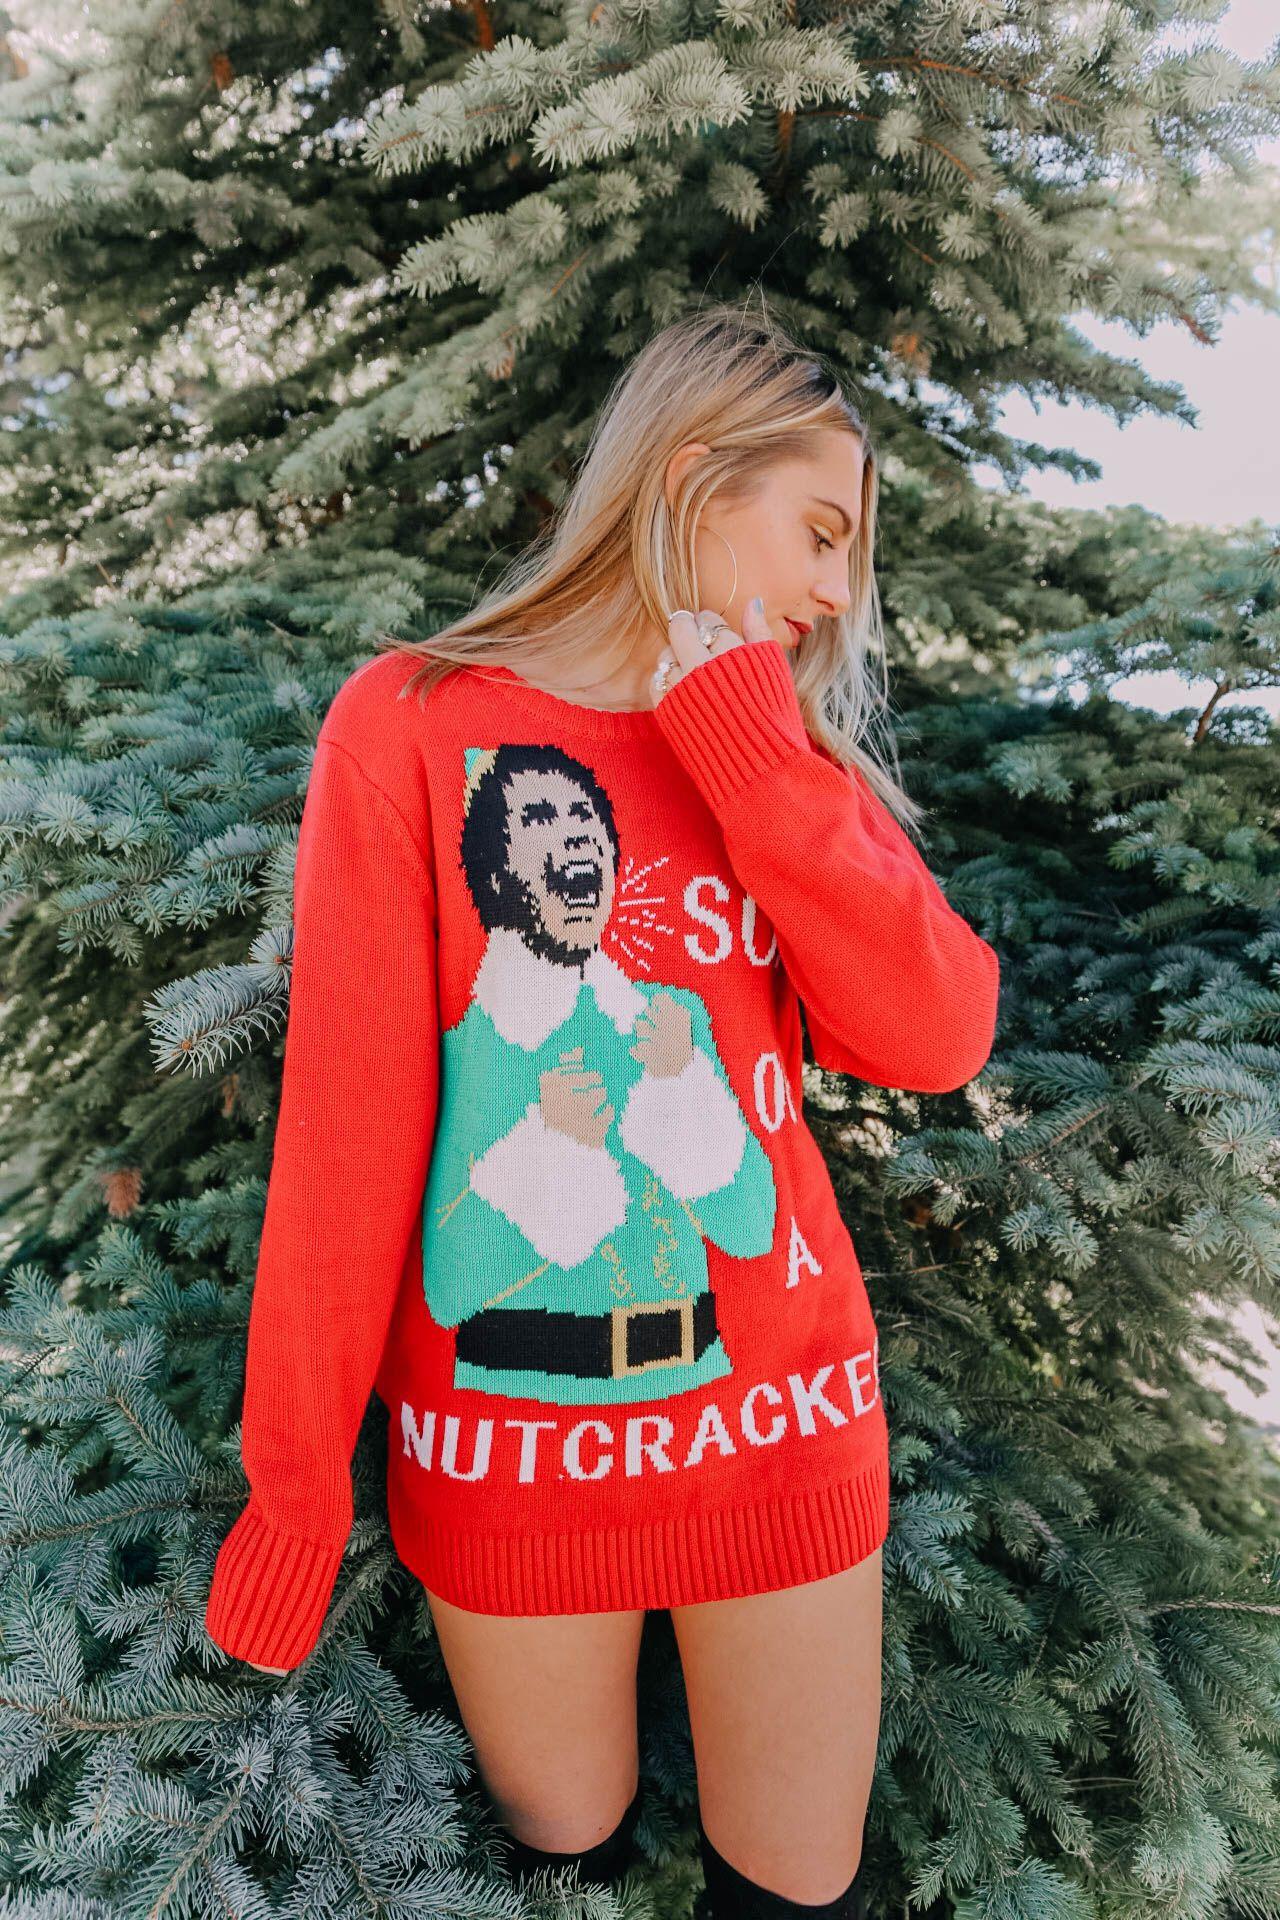 Happy Holidays // #christmas #christmaspictureideas #christmasdecor #cutechristmaspictures #cutechristmaspicturideas #homedecor #decor #christmasdecorations #christmastree #santaclause #christmastreeideas #christmascookies #christmascrafts #christmaspartyideas #christmasoutfit #christmasoutfits #christmasmovies #flatlays #christmasflatlay #winter #winterwonderland #ootd #ootdwinter #fashion #cutewinteroutfits #winteroutfitideas #christmas2018 #christmas18 #elf #santaclause